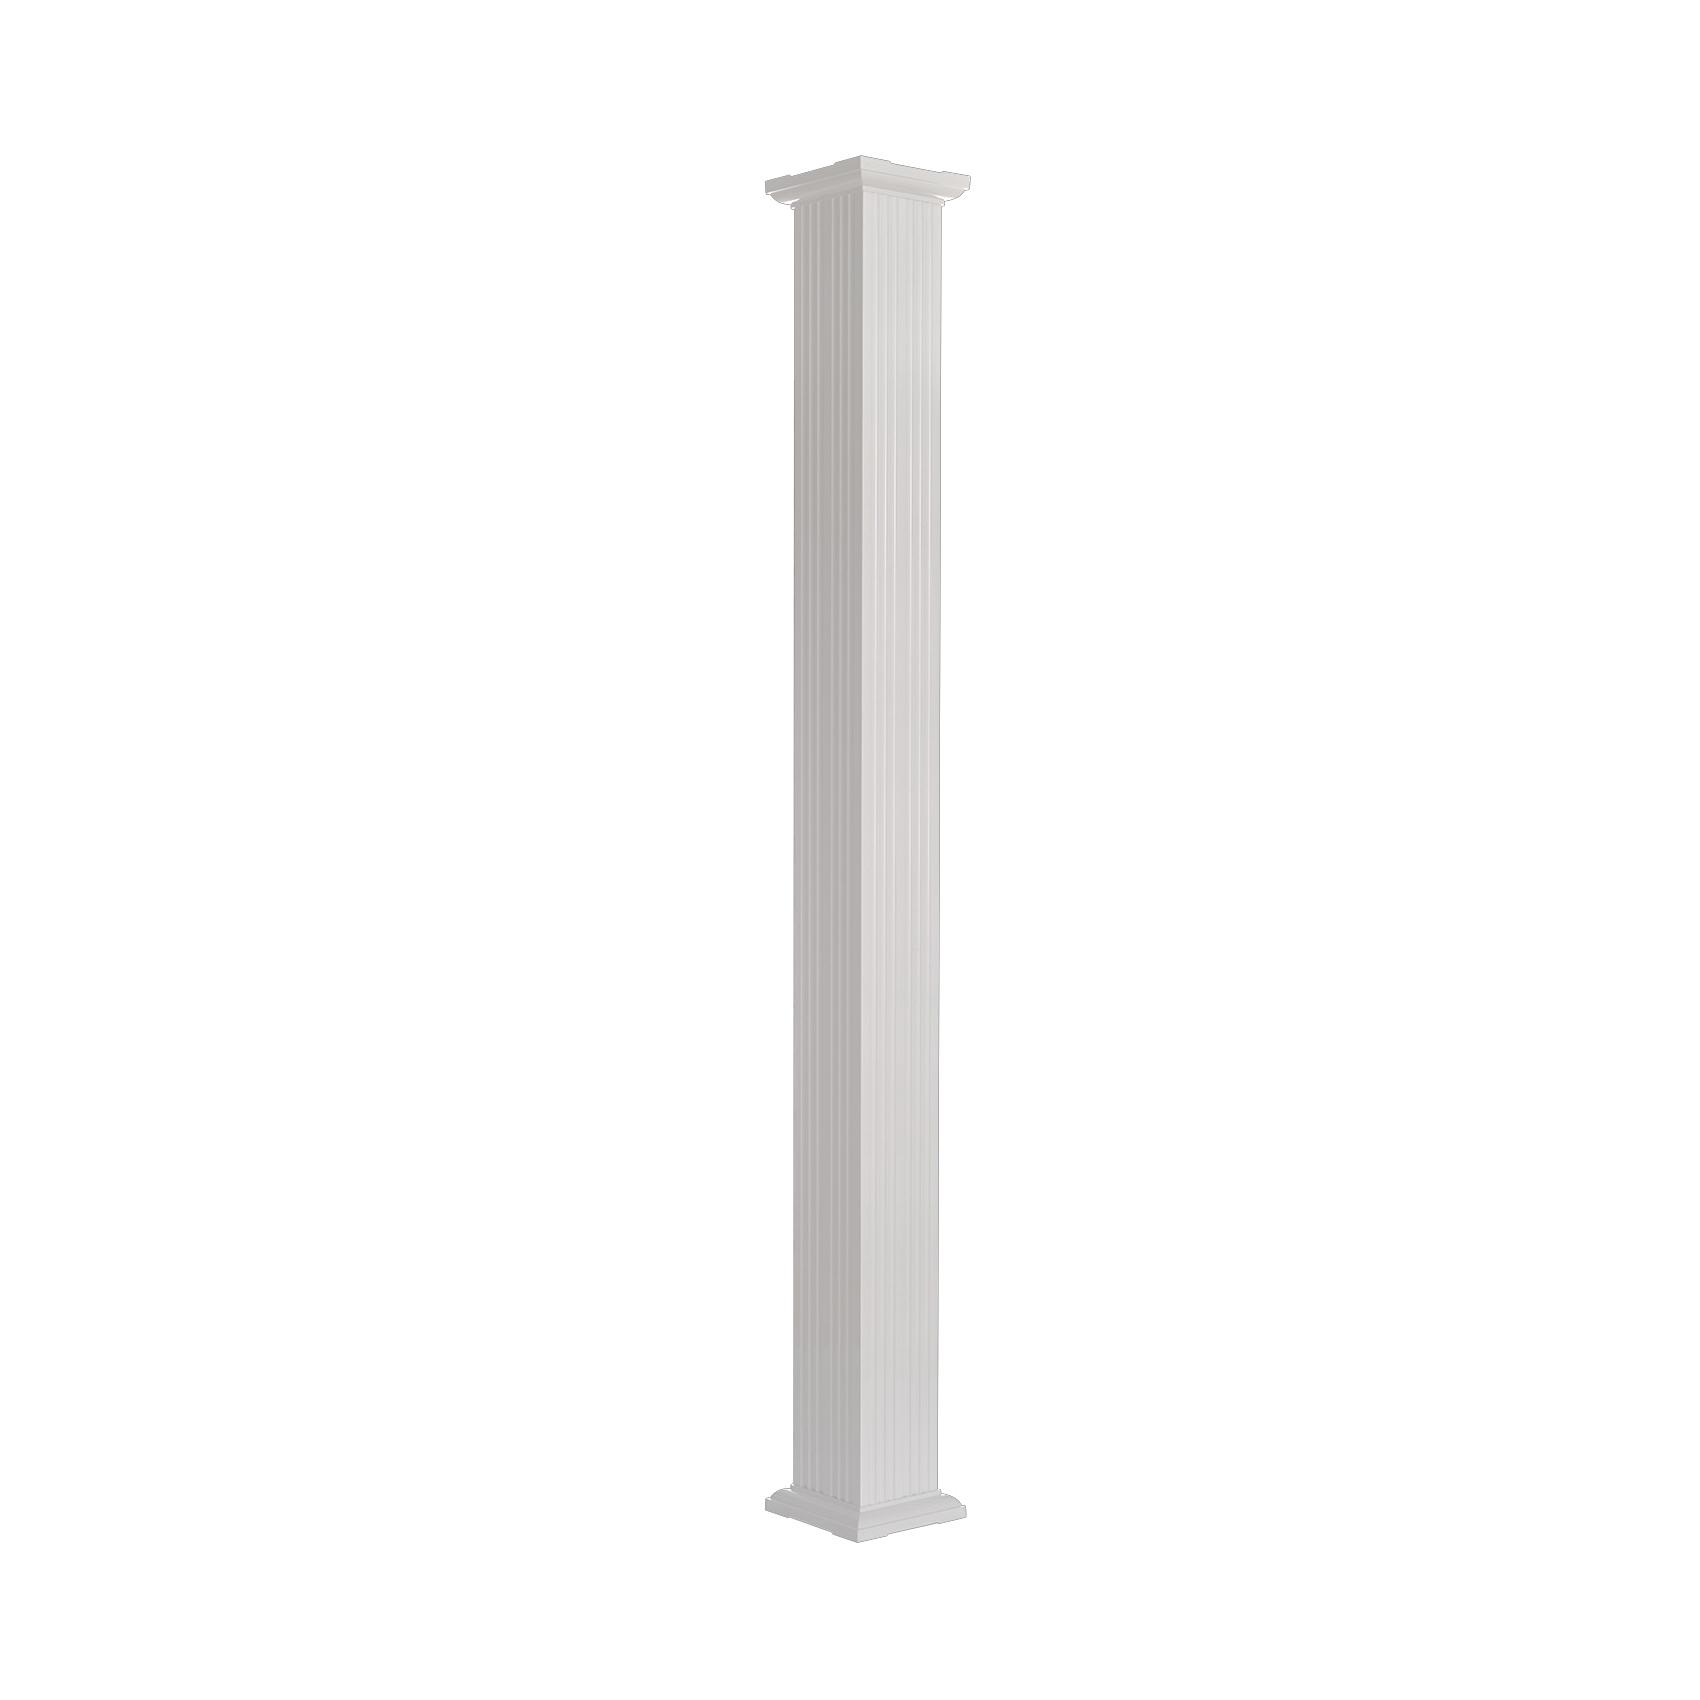 Picture of AFCO 800AC610 Square Column, 10 ft H, Square, Aluminum, White